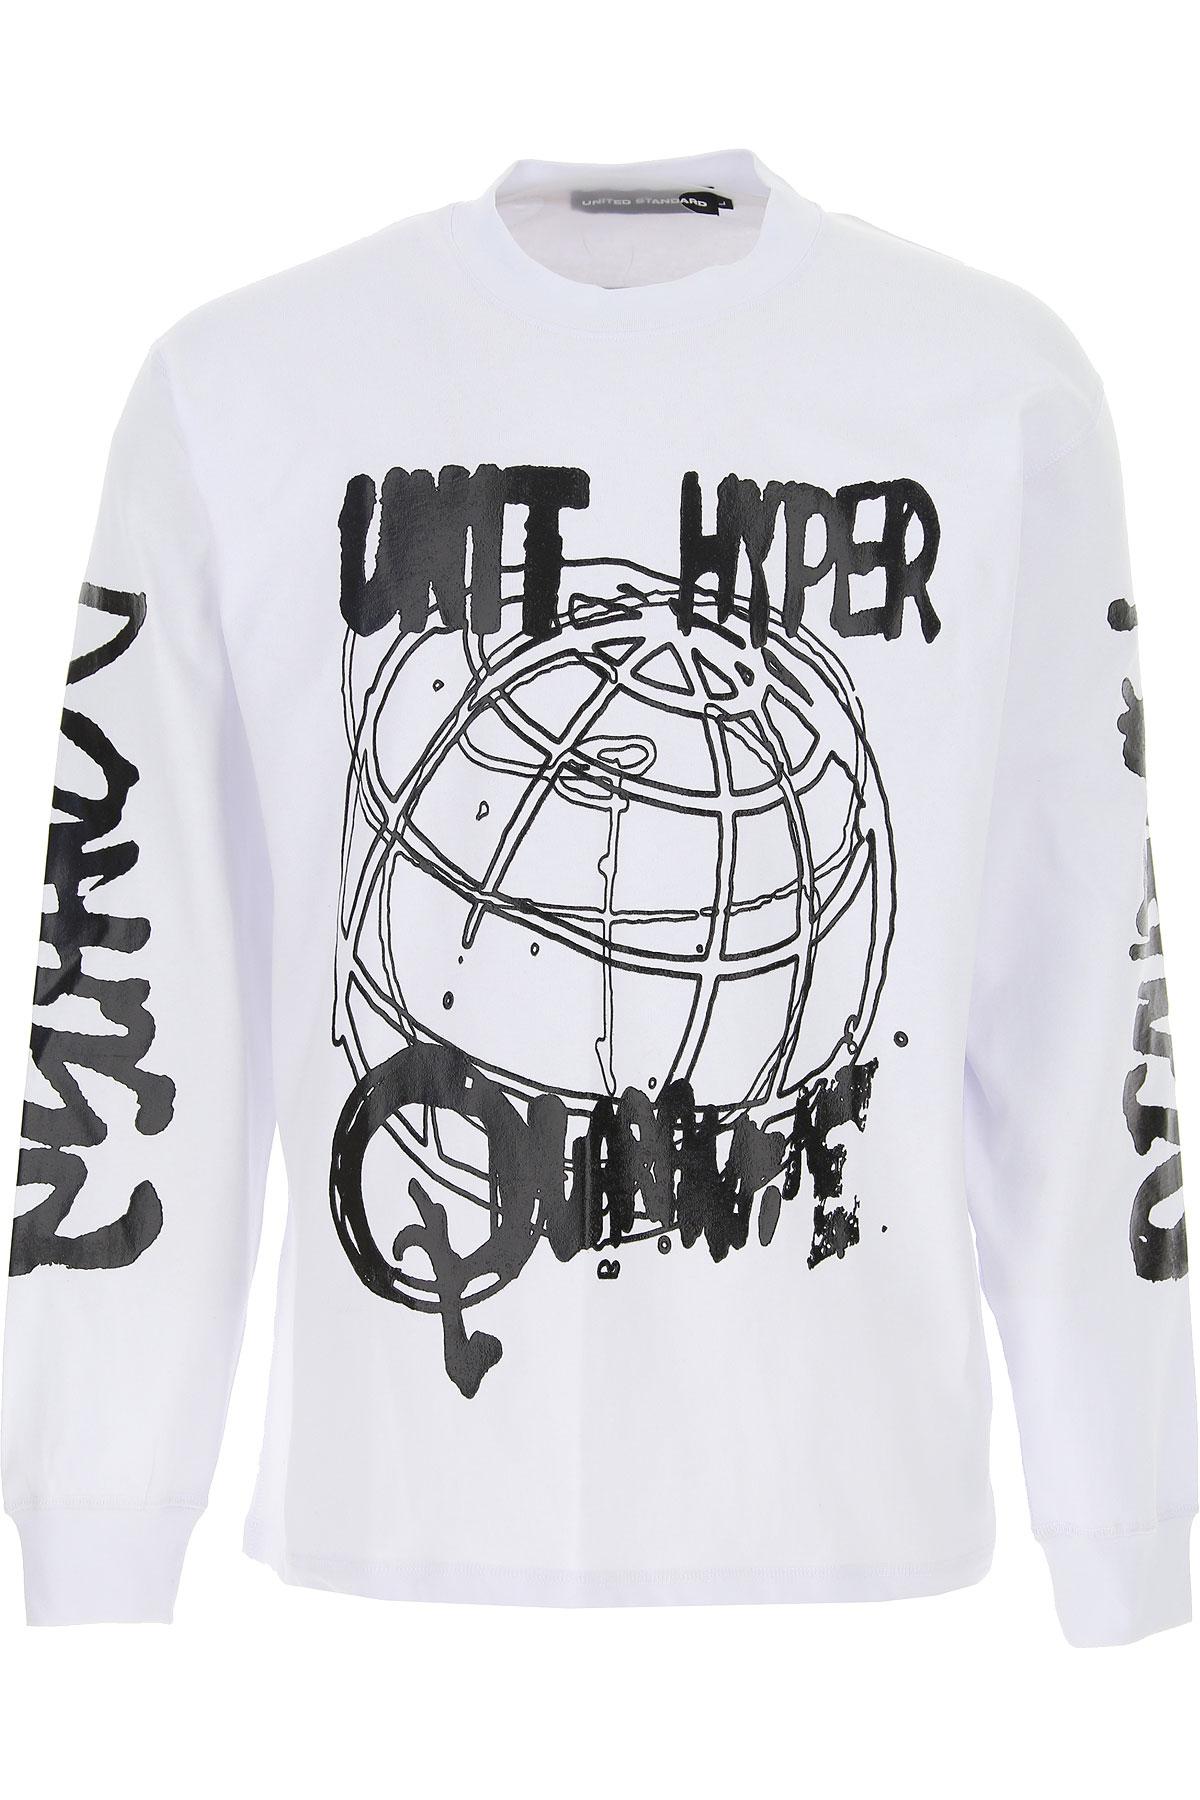 United Standard T-Shirt for Men, White, Cotton, 2019, L M S